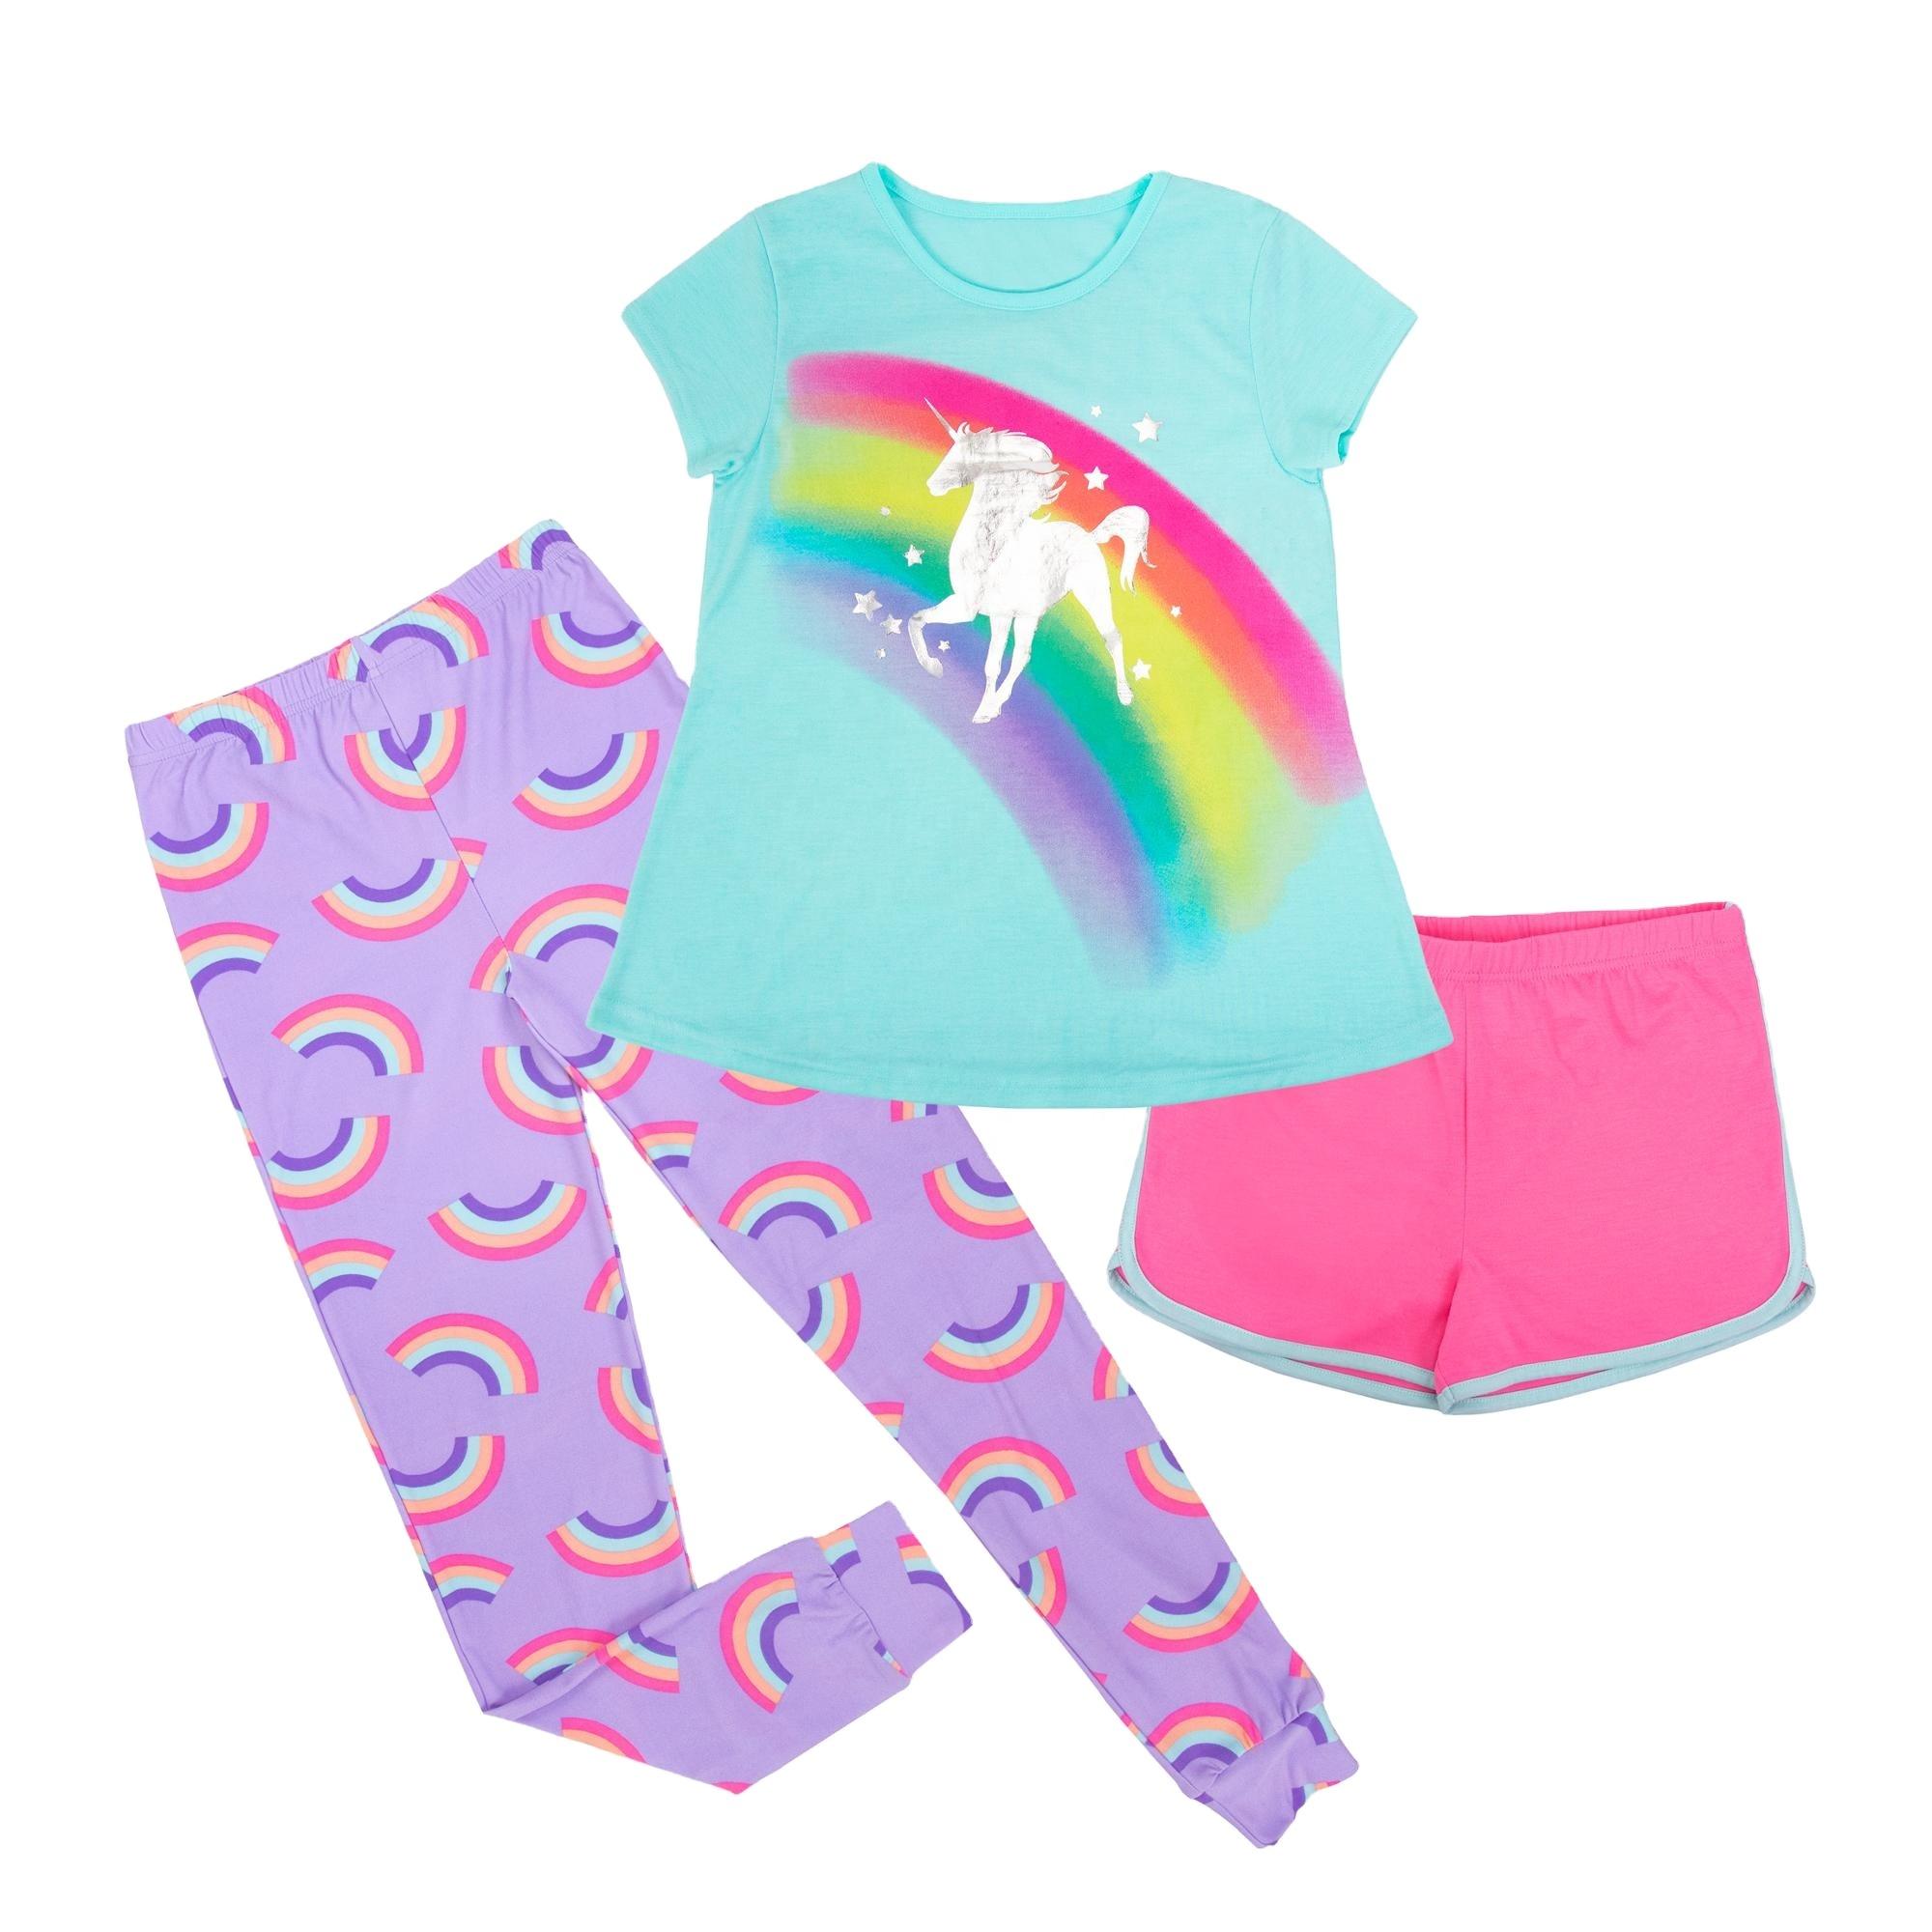 Rainbow Unicorn Tee Shirt Seluruh Cetak Anak-anak P-Urple Celana OEM Anak-anak FR Baju Tidur Gadis Piyama Set